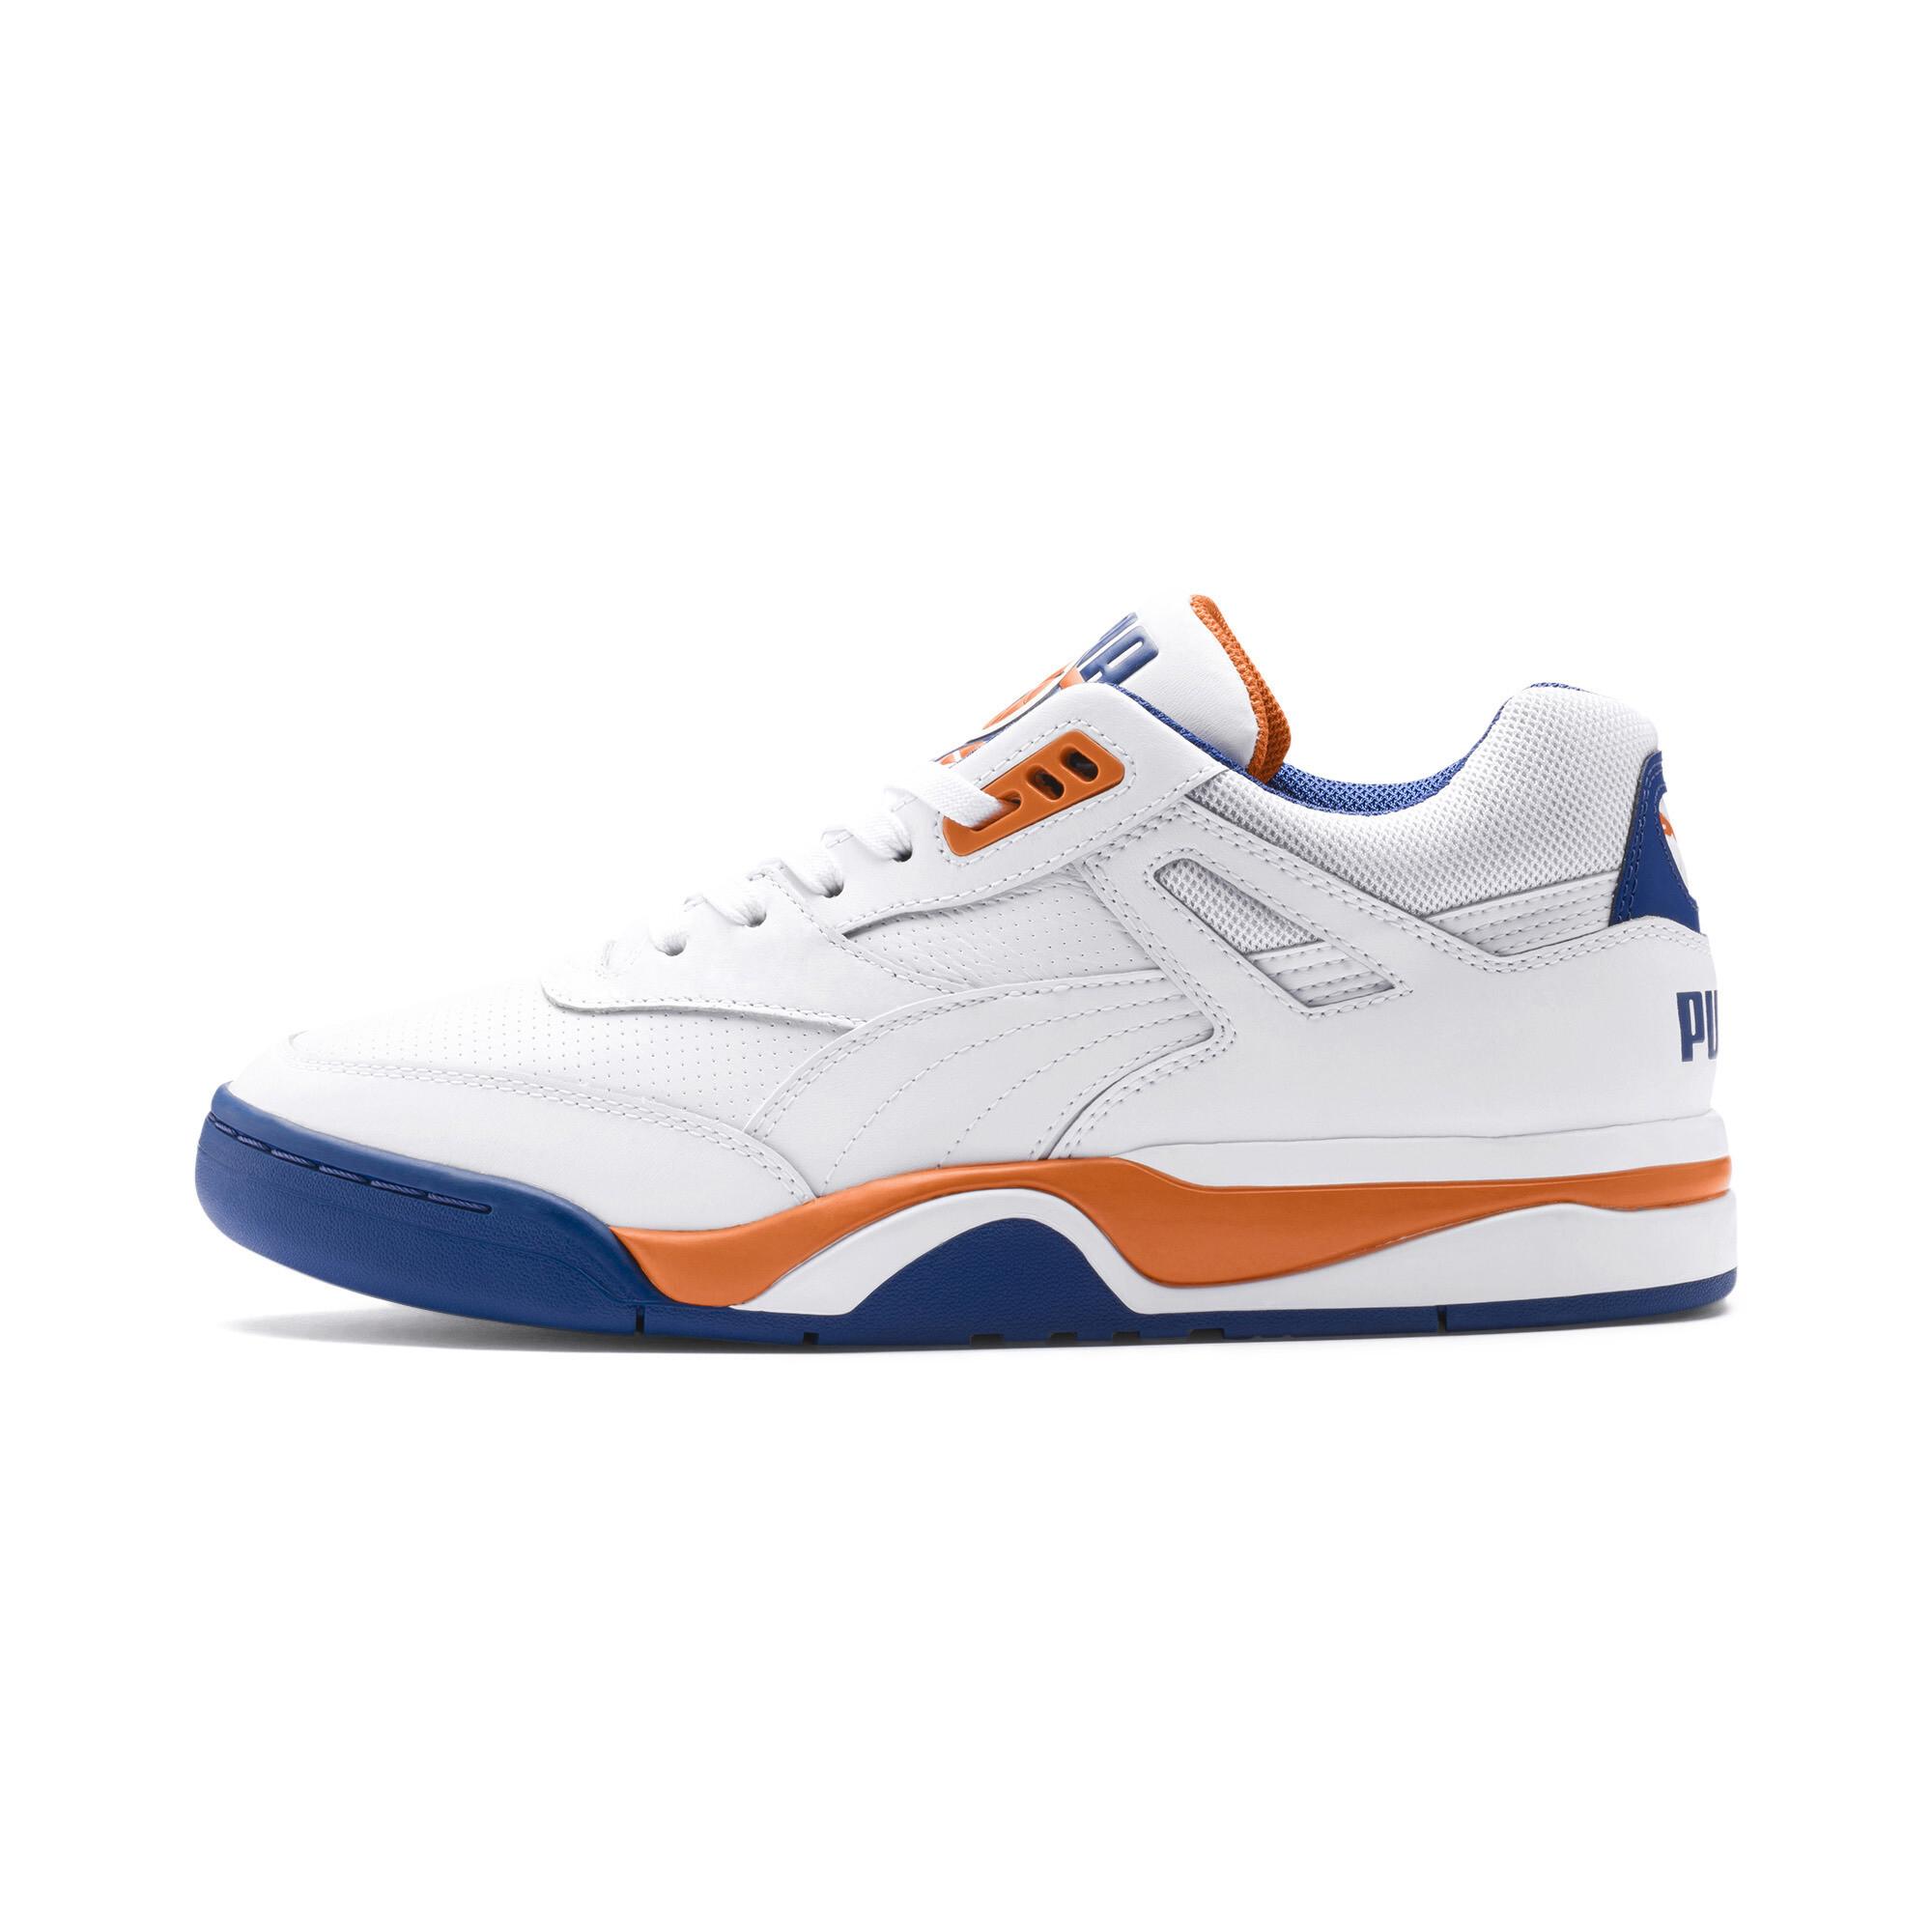 Indexbild 31 - PUMA Palace Guard Sneaker Unisex Schuhe Sport Classics Neu